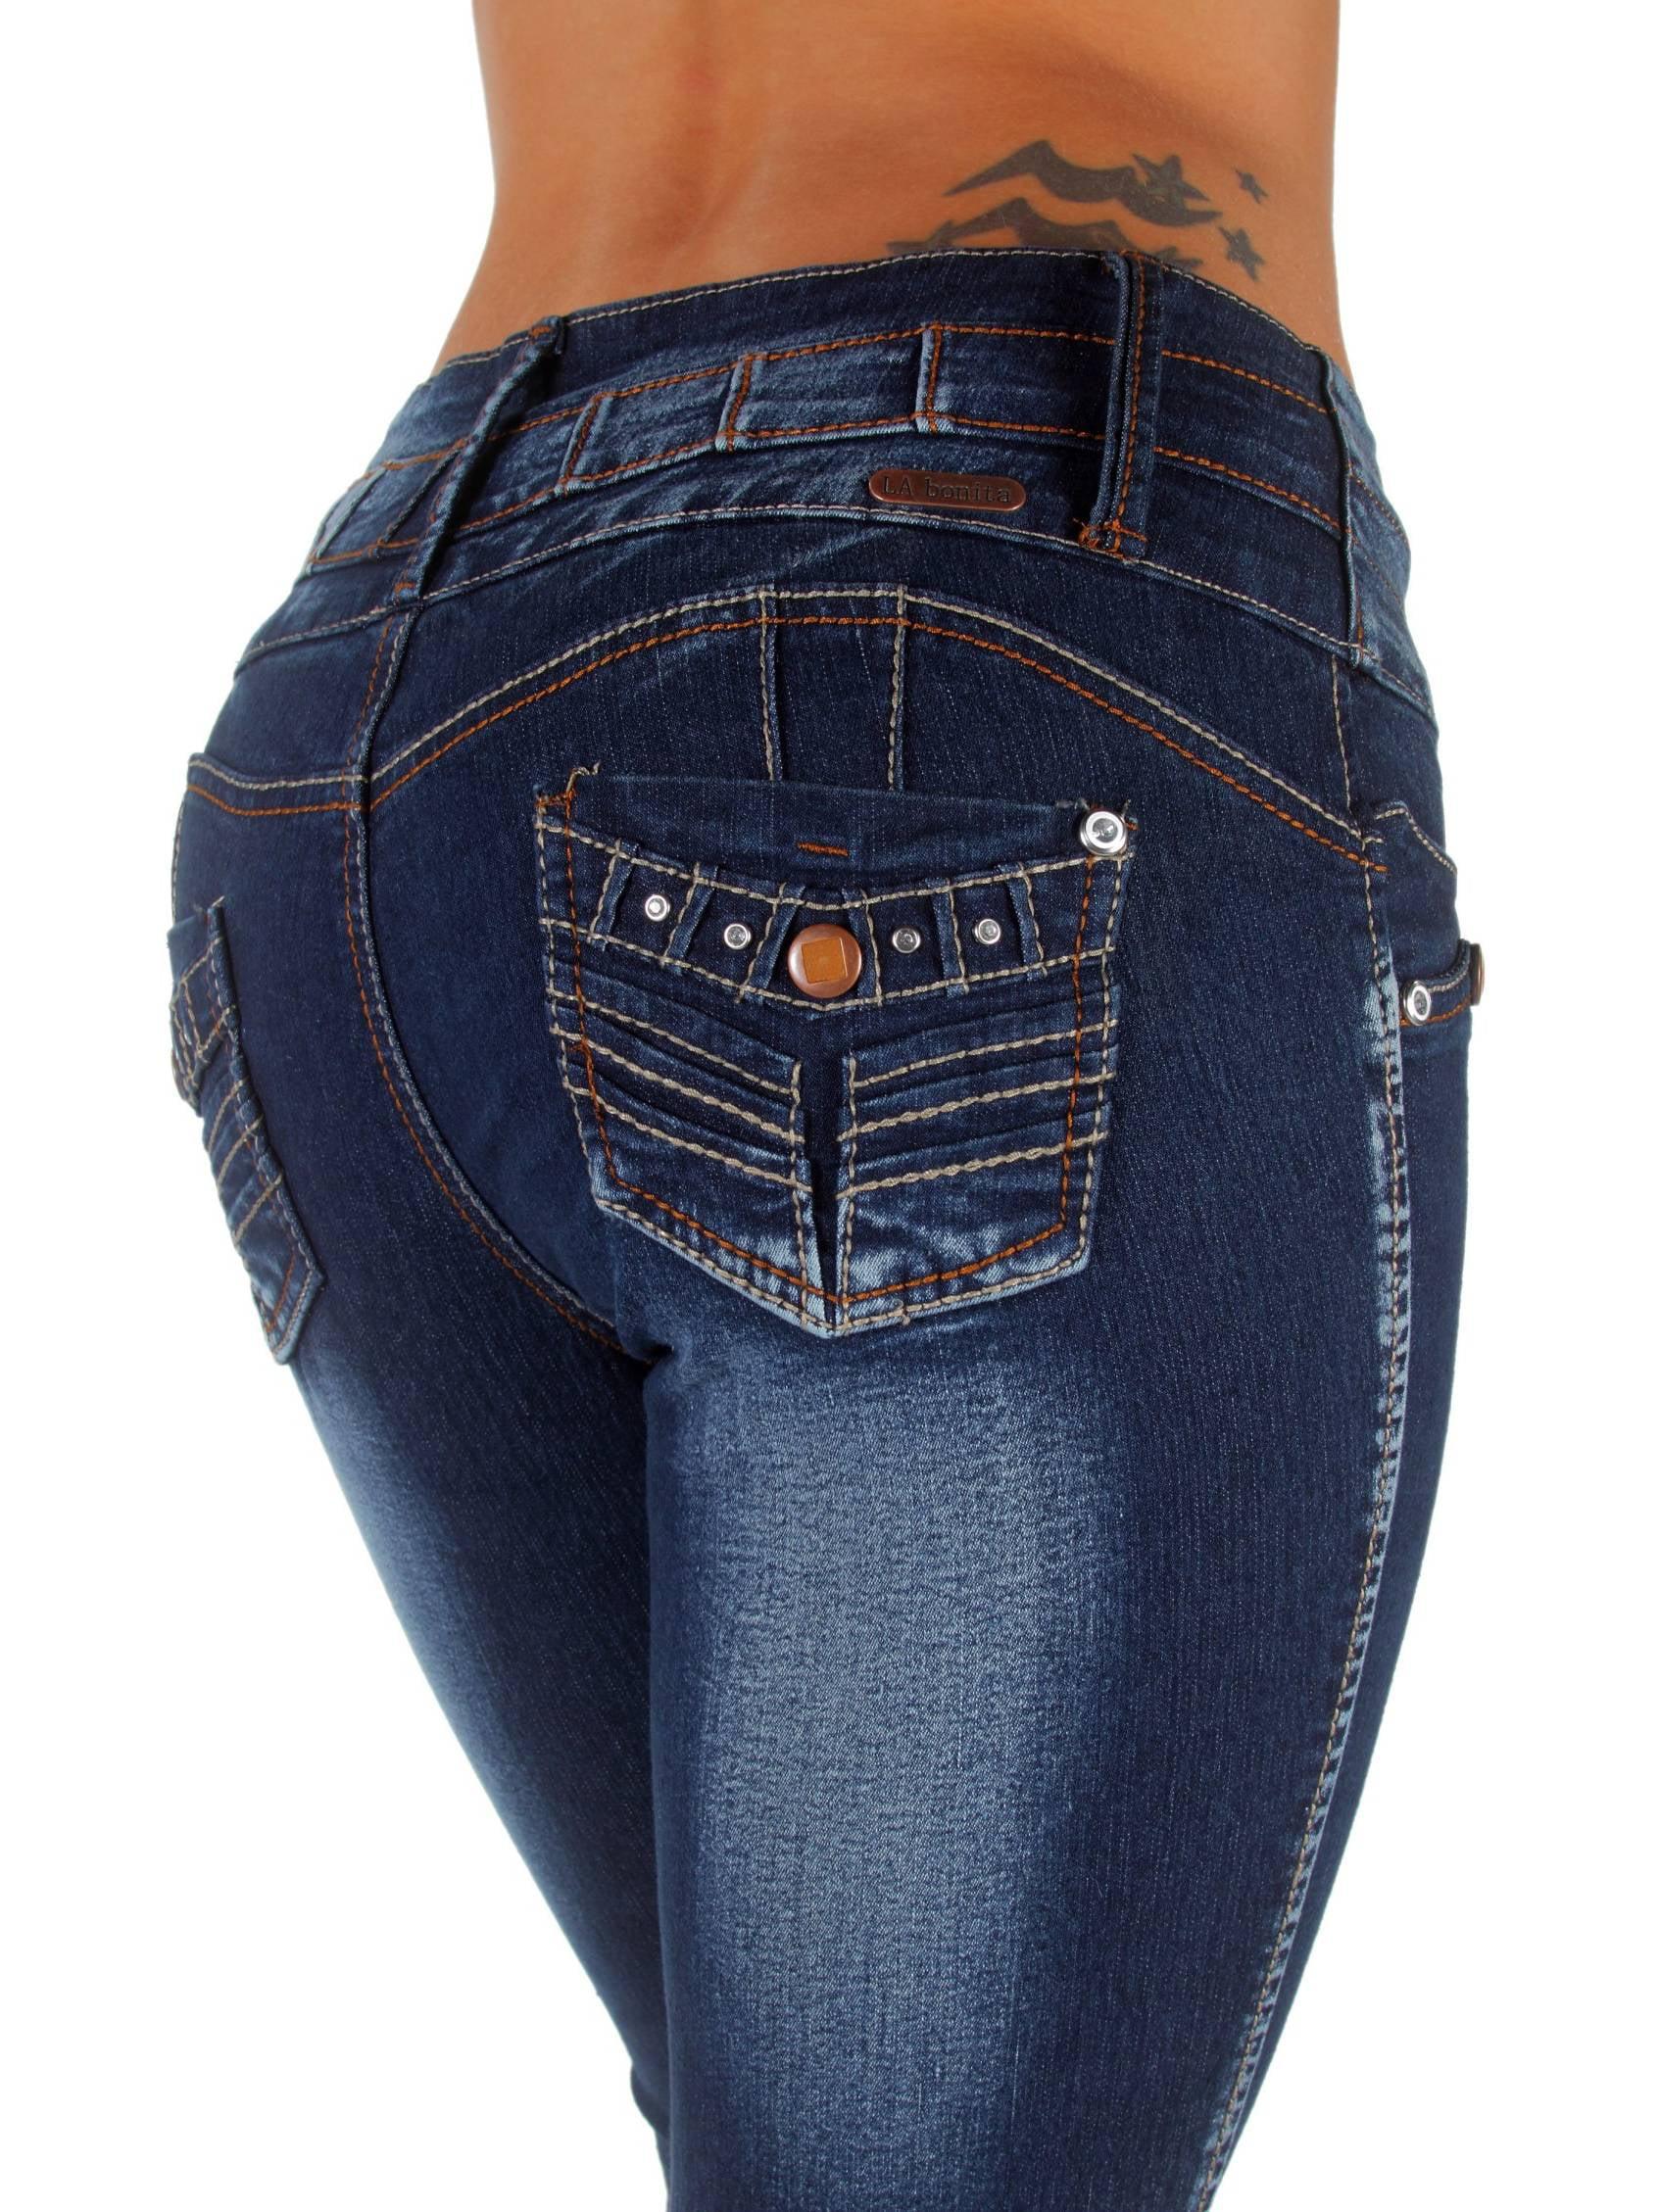 Plus Size, Colombian Design, Mid Waist, Butt Lift Skinny Jeans